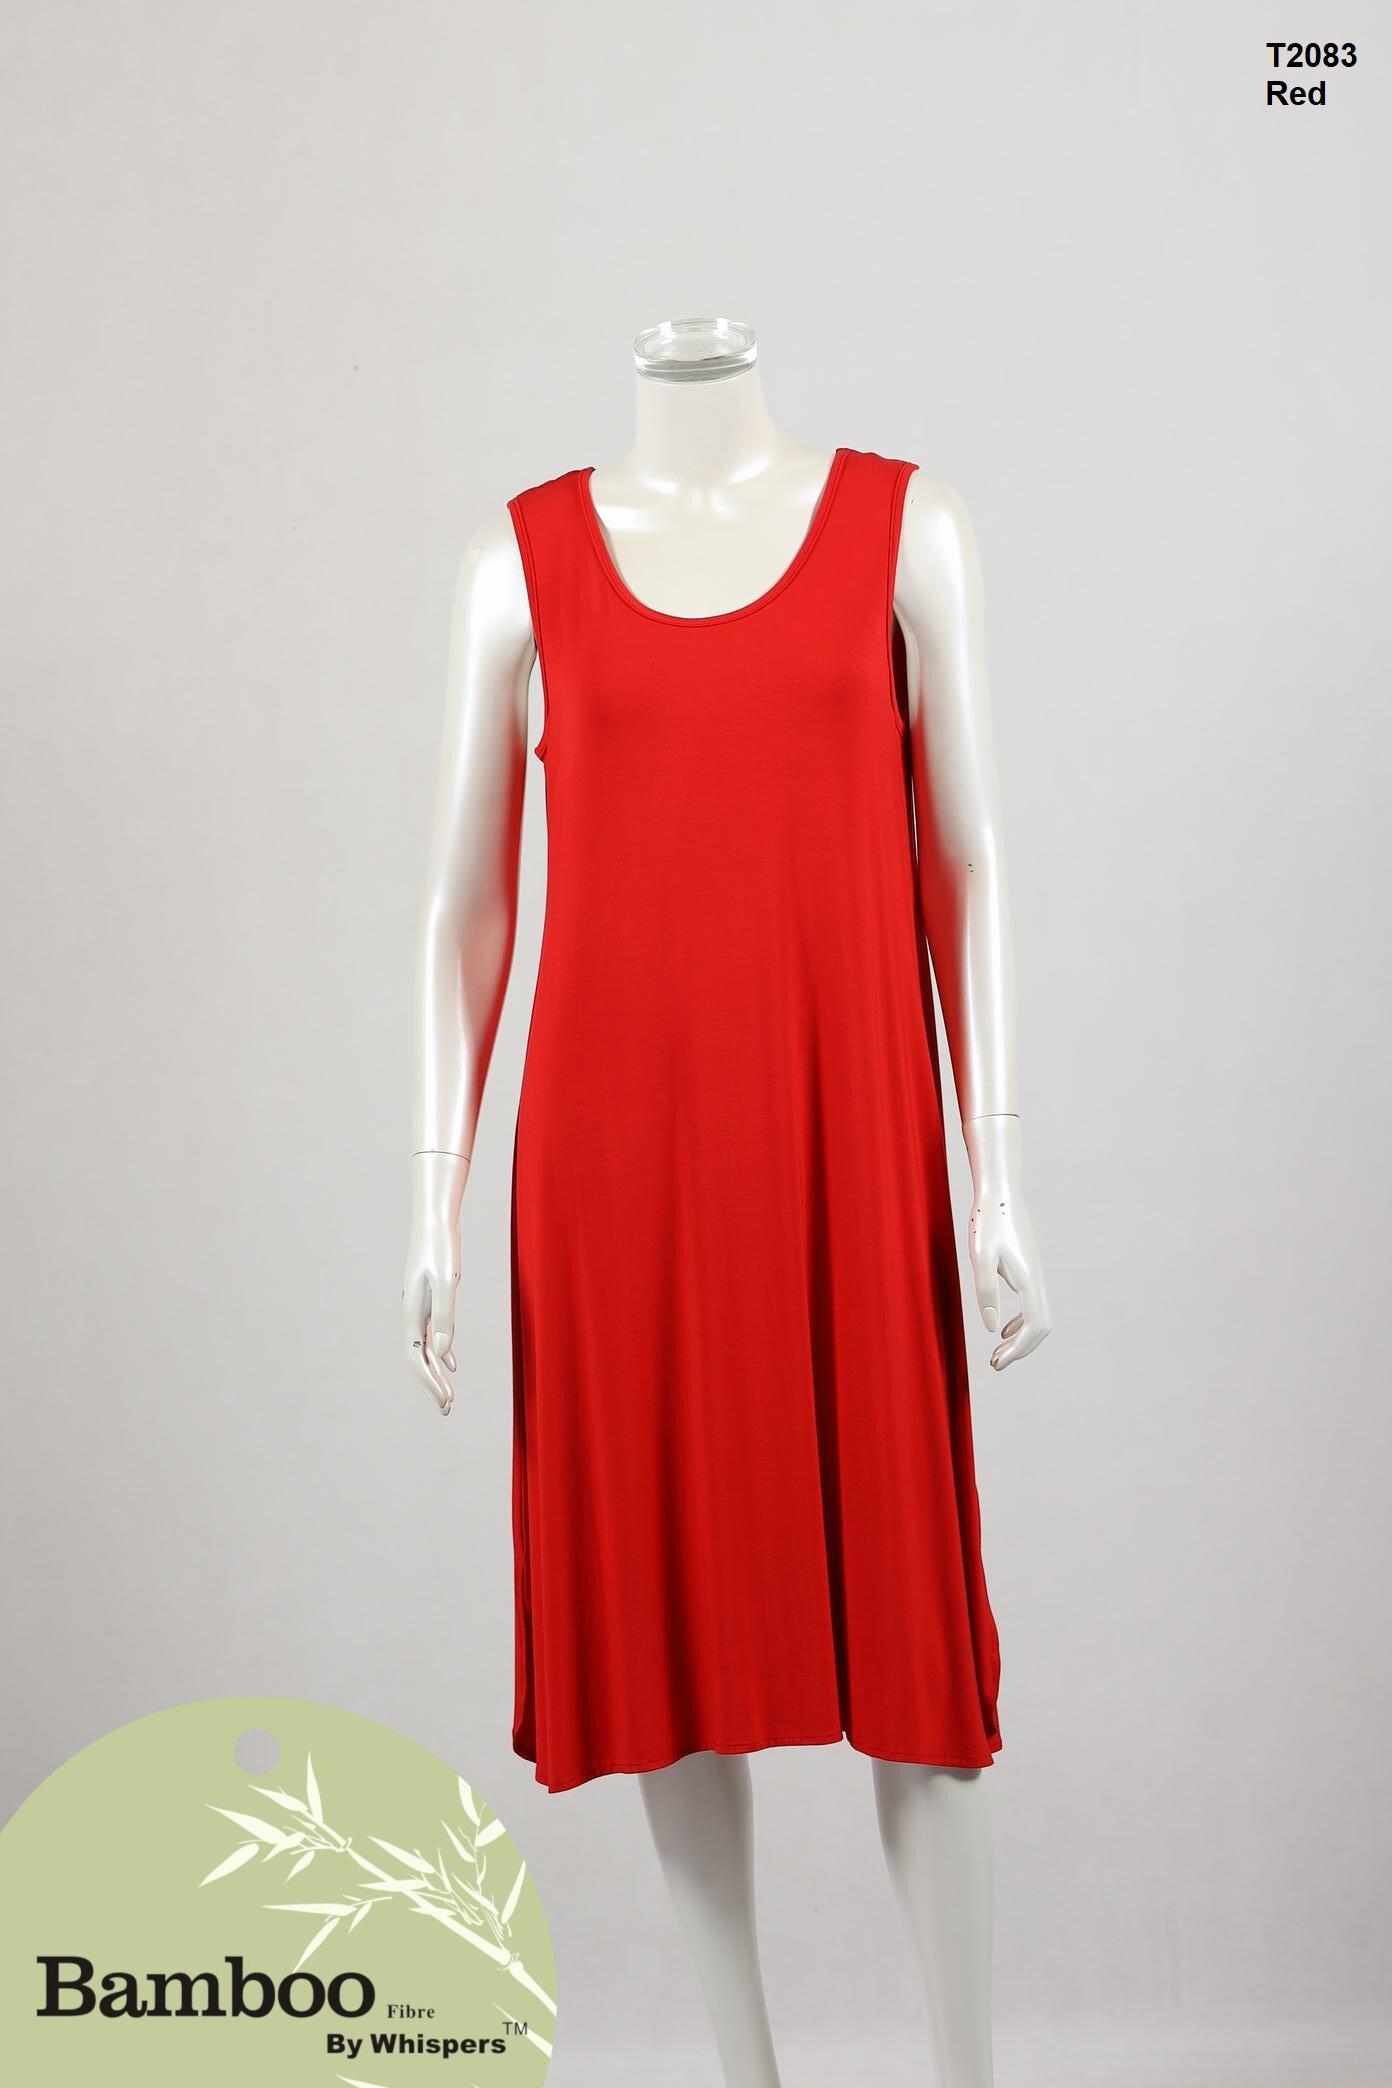 T2083-Bamboo Dress-Red.JPG